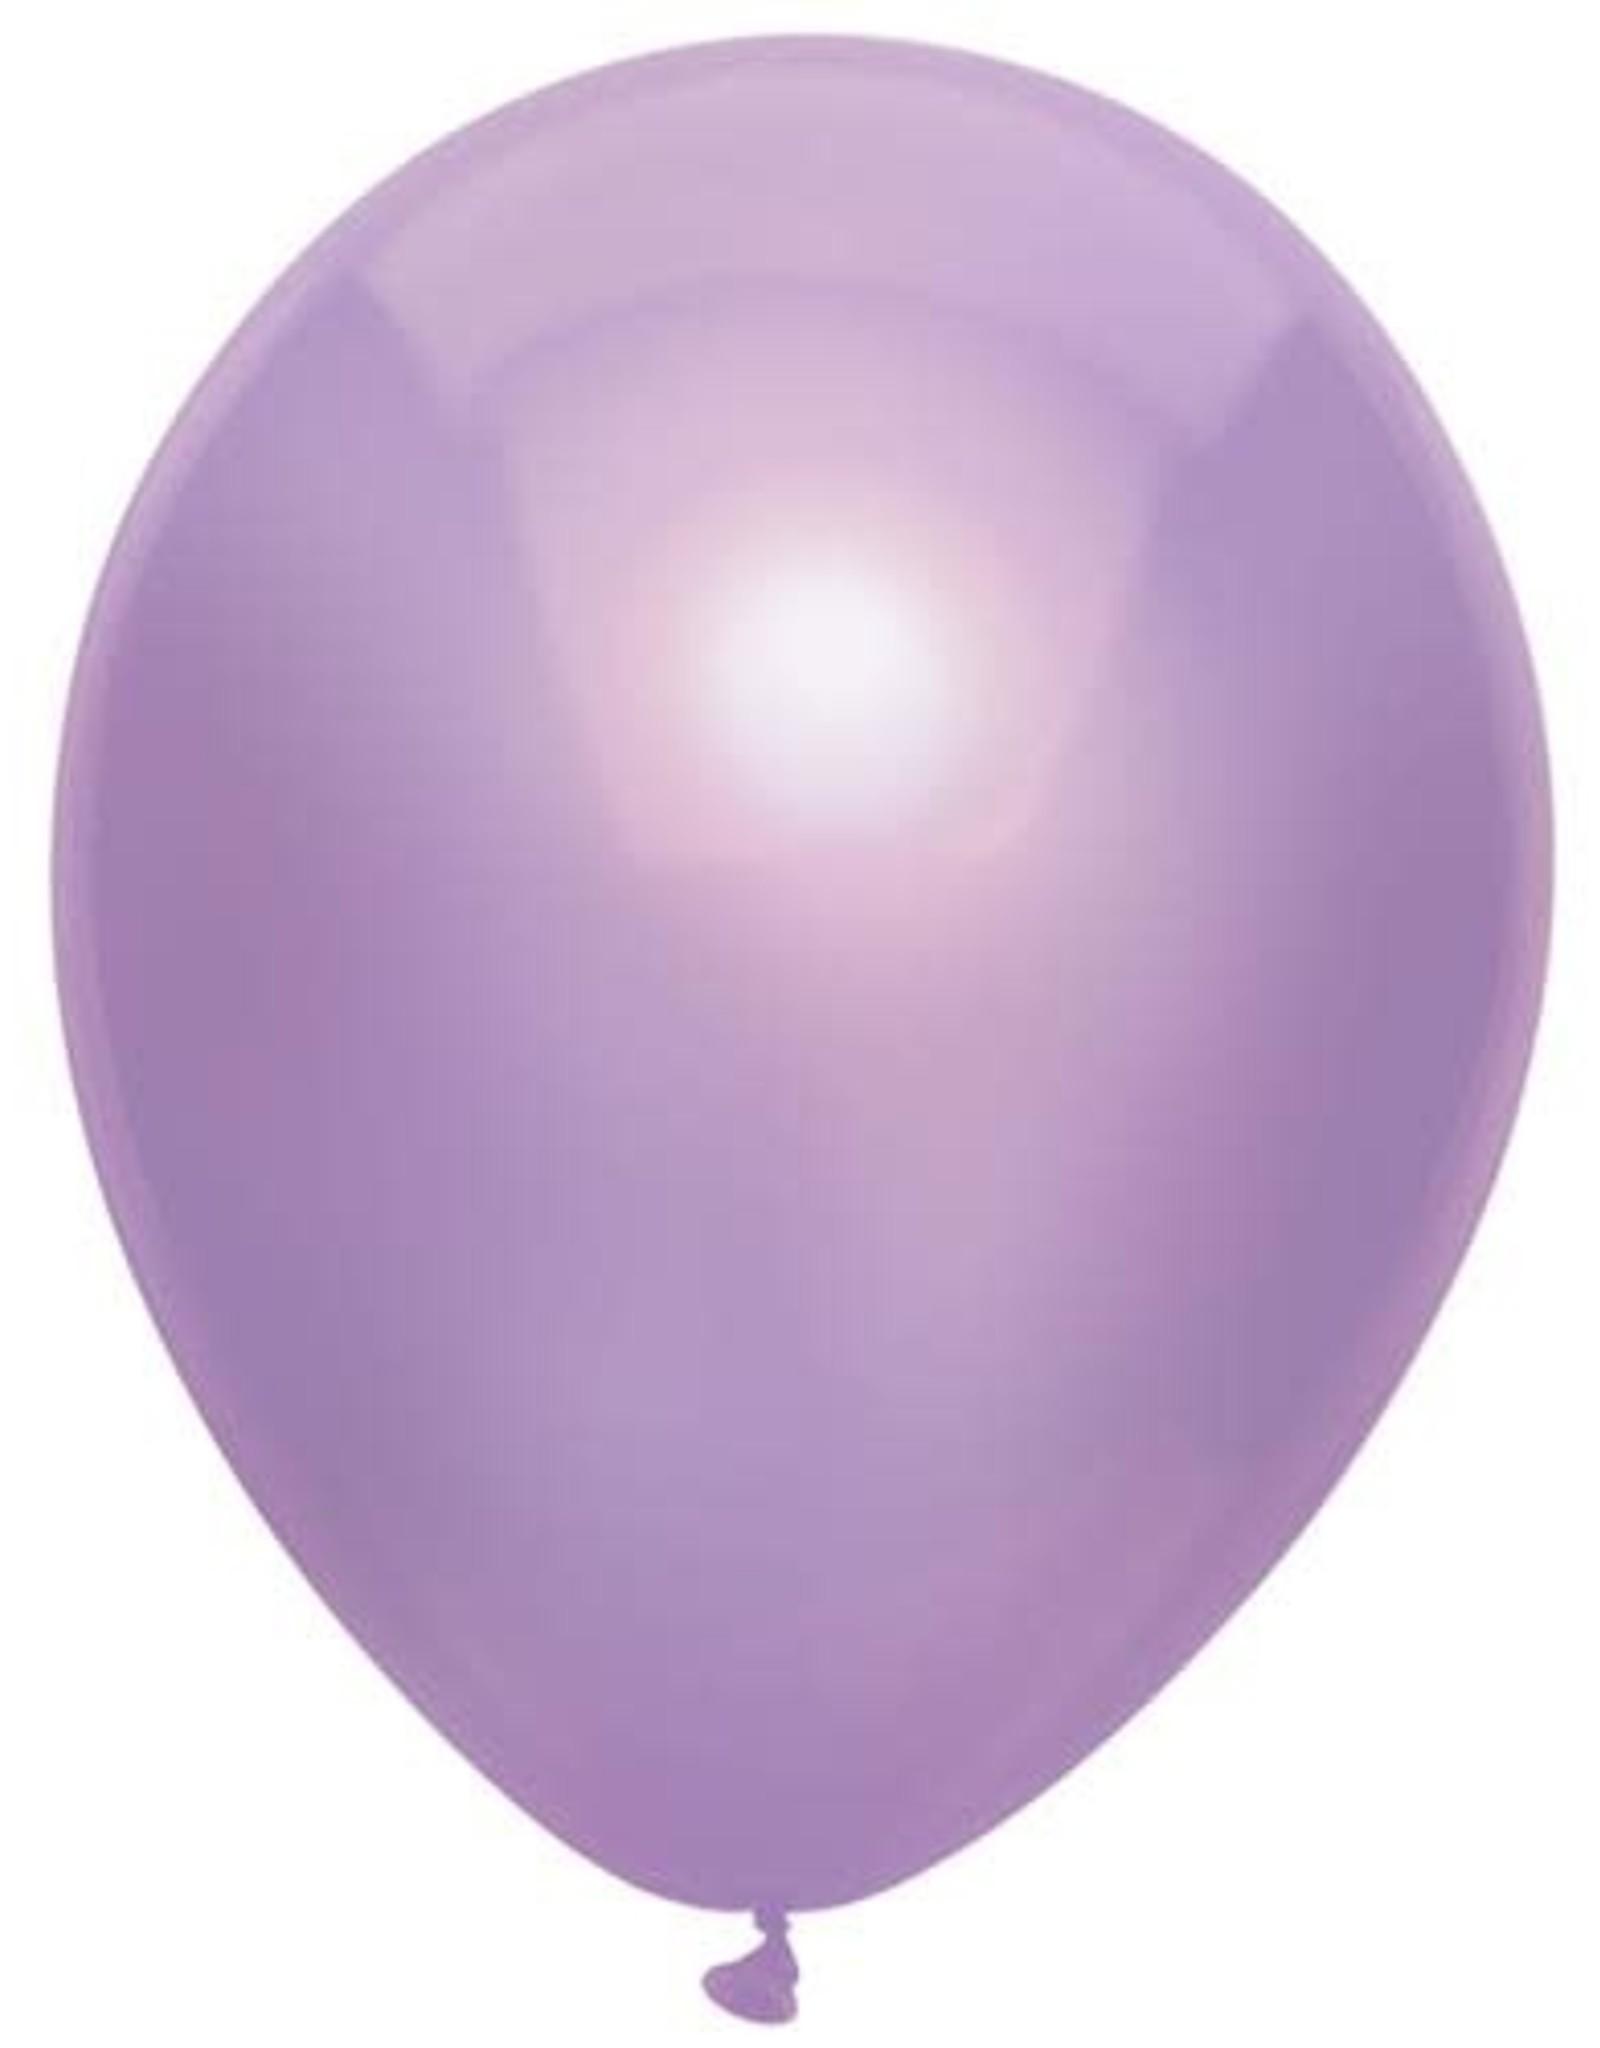 Haza Ballonnen Uni Metallic Lila (30 cm, 100 stuks)